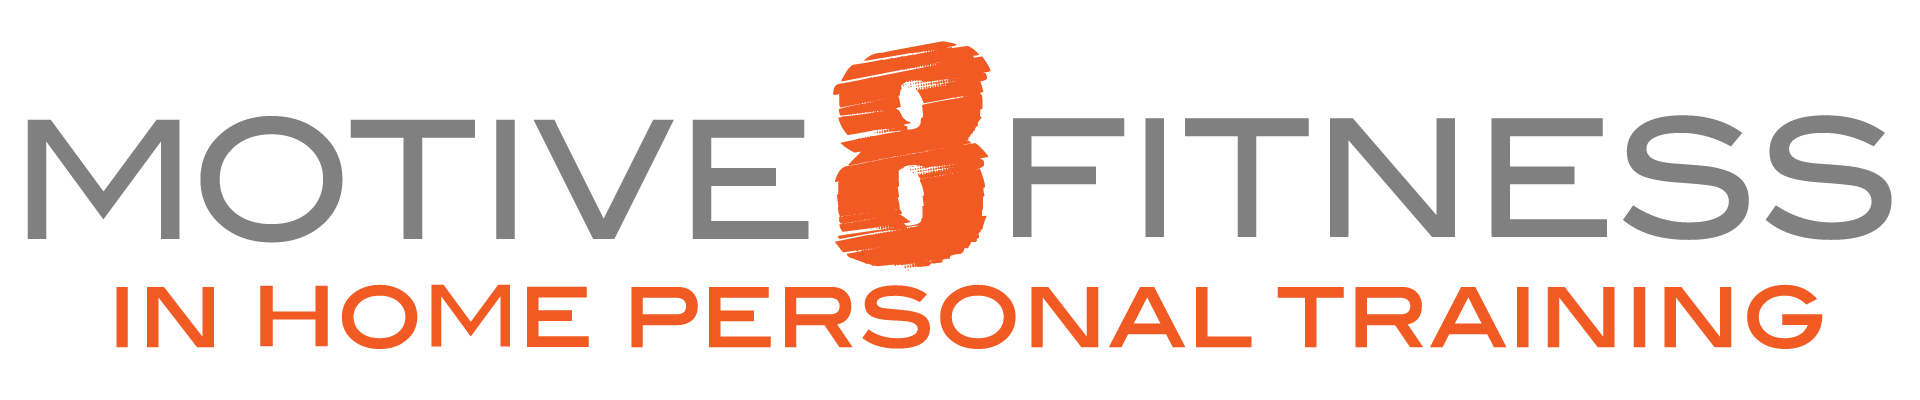 motive 8 fitness logo